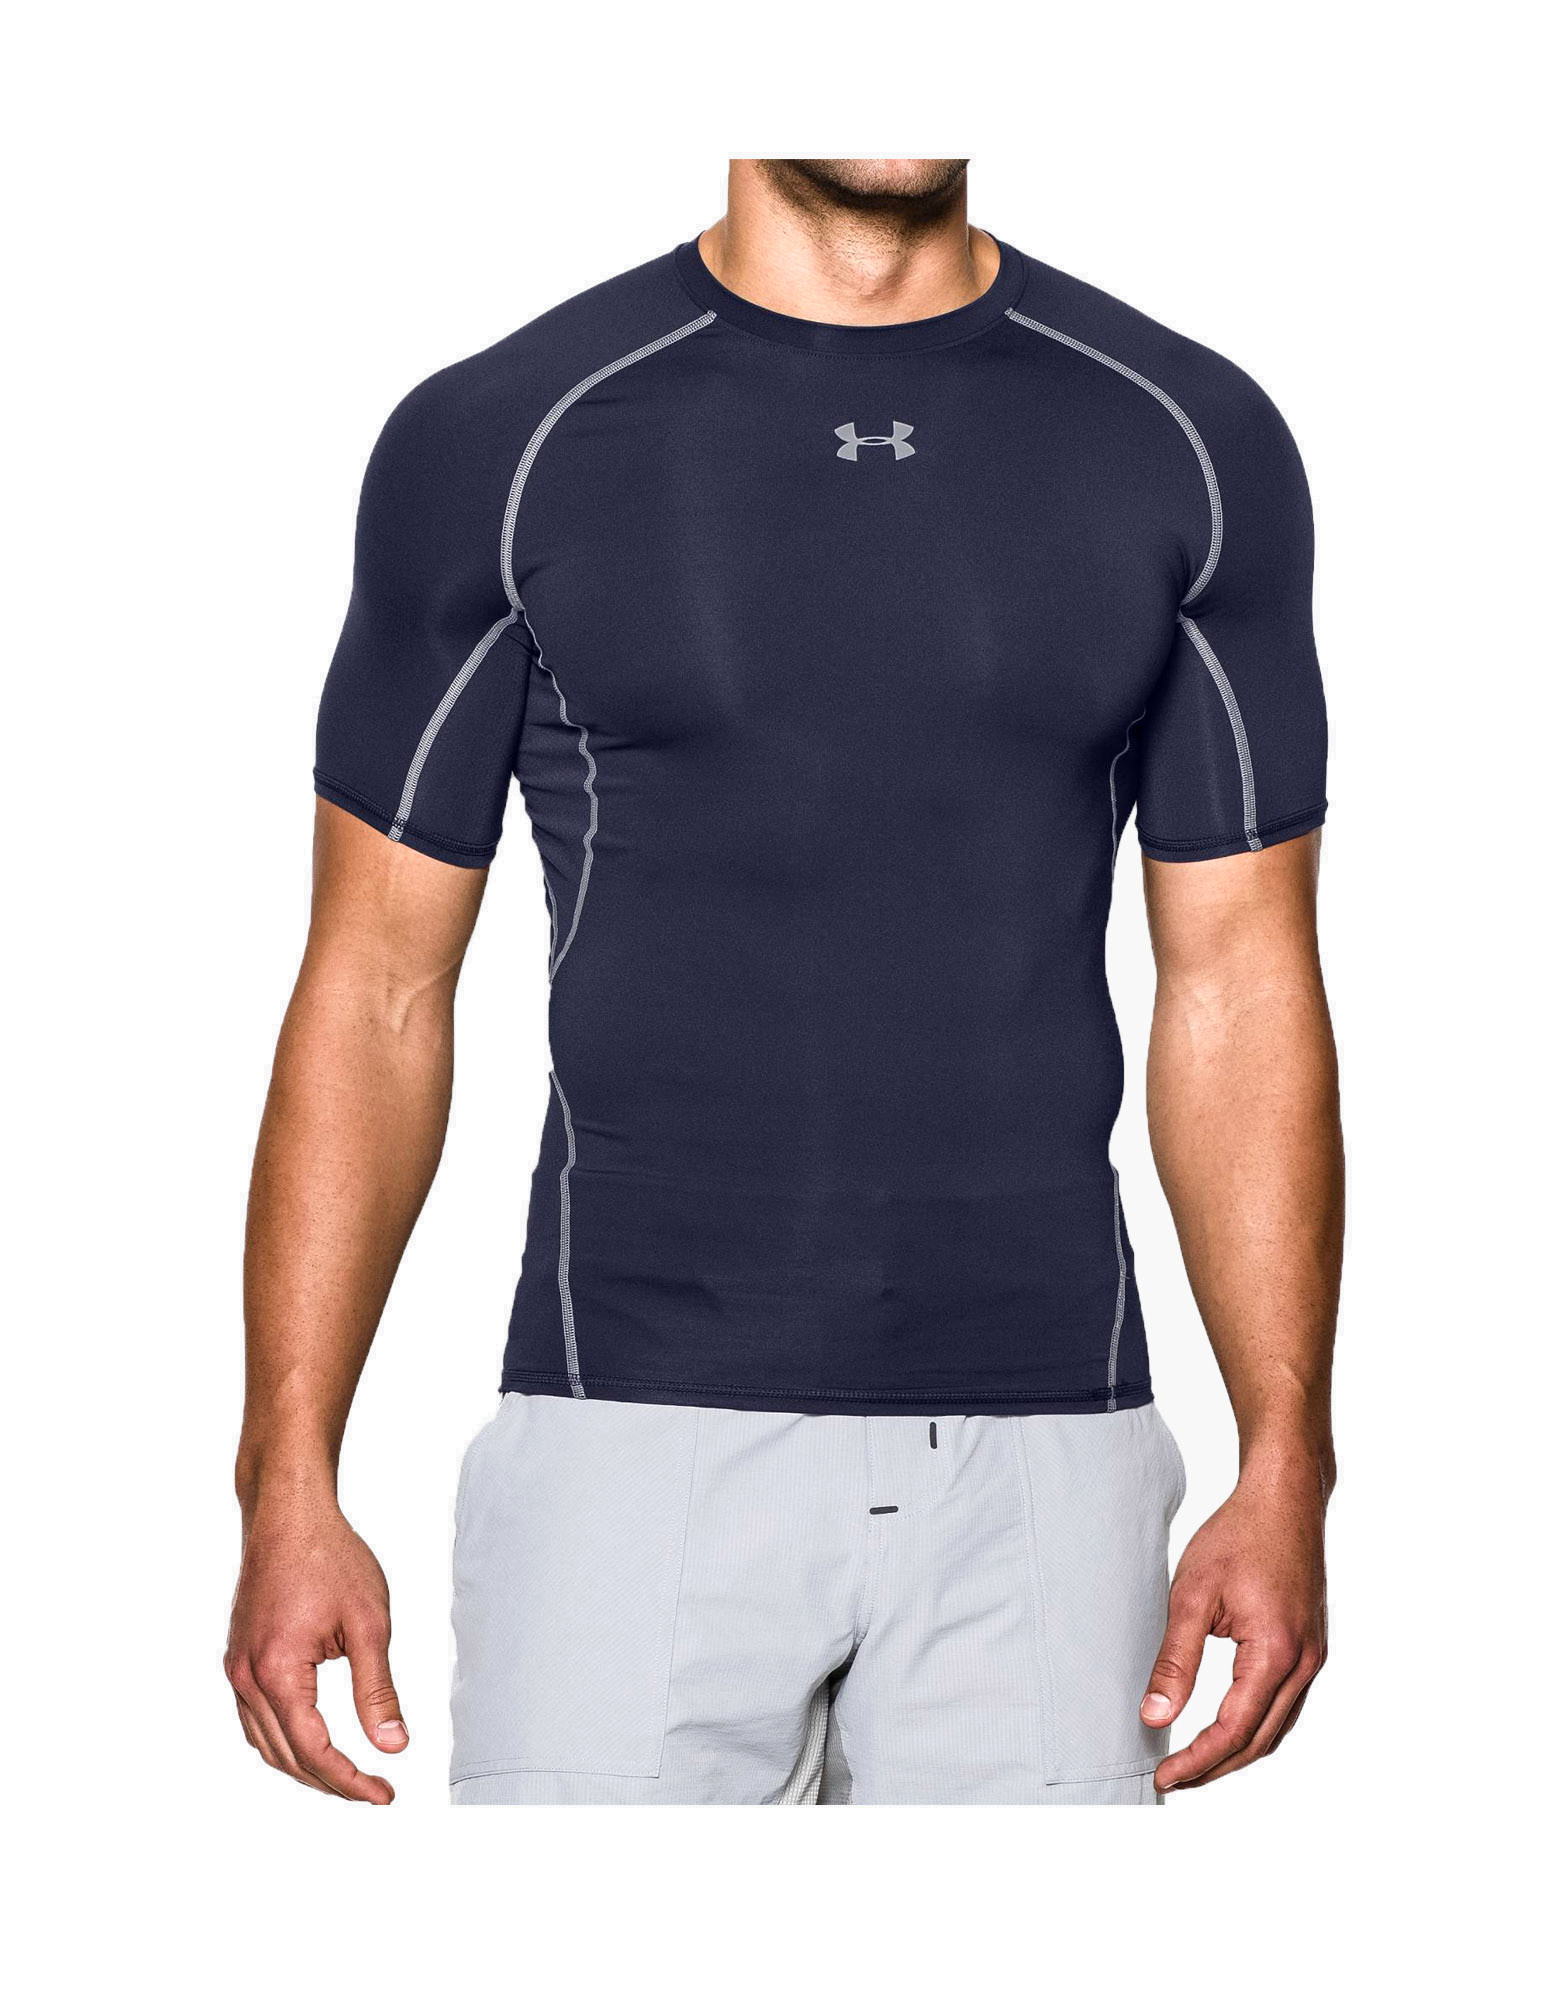 Under Armour Mens Heatgear Shorts